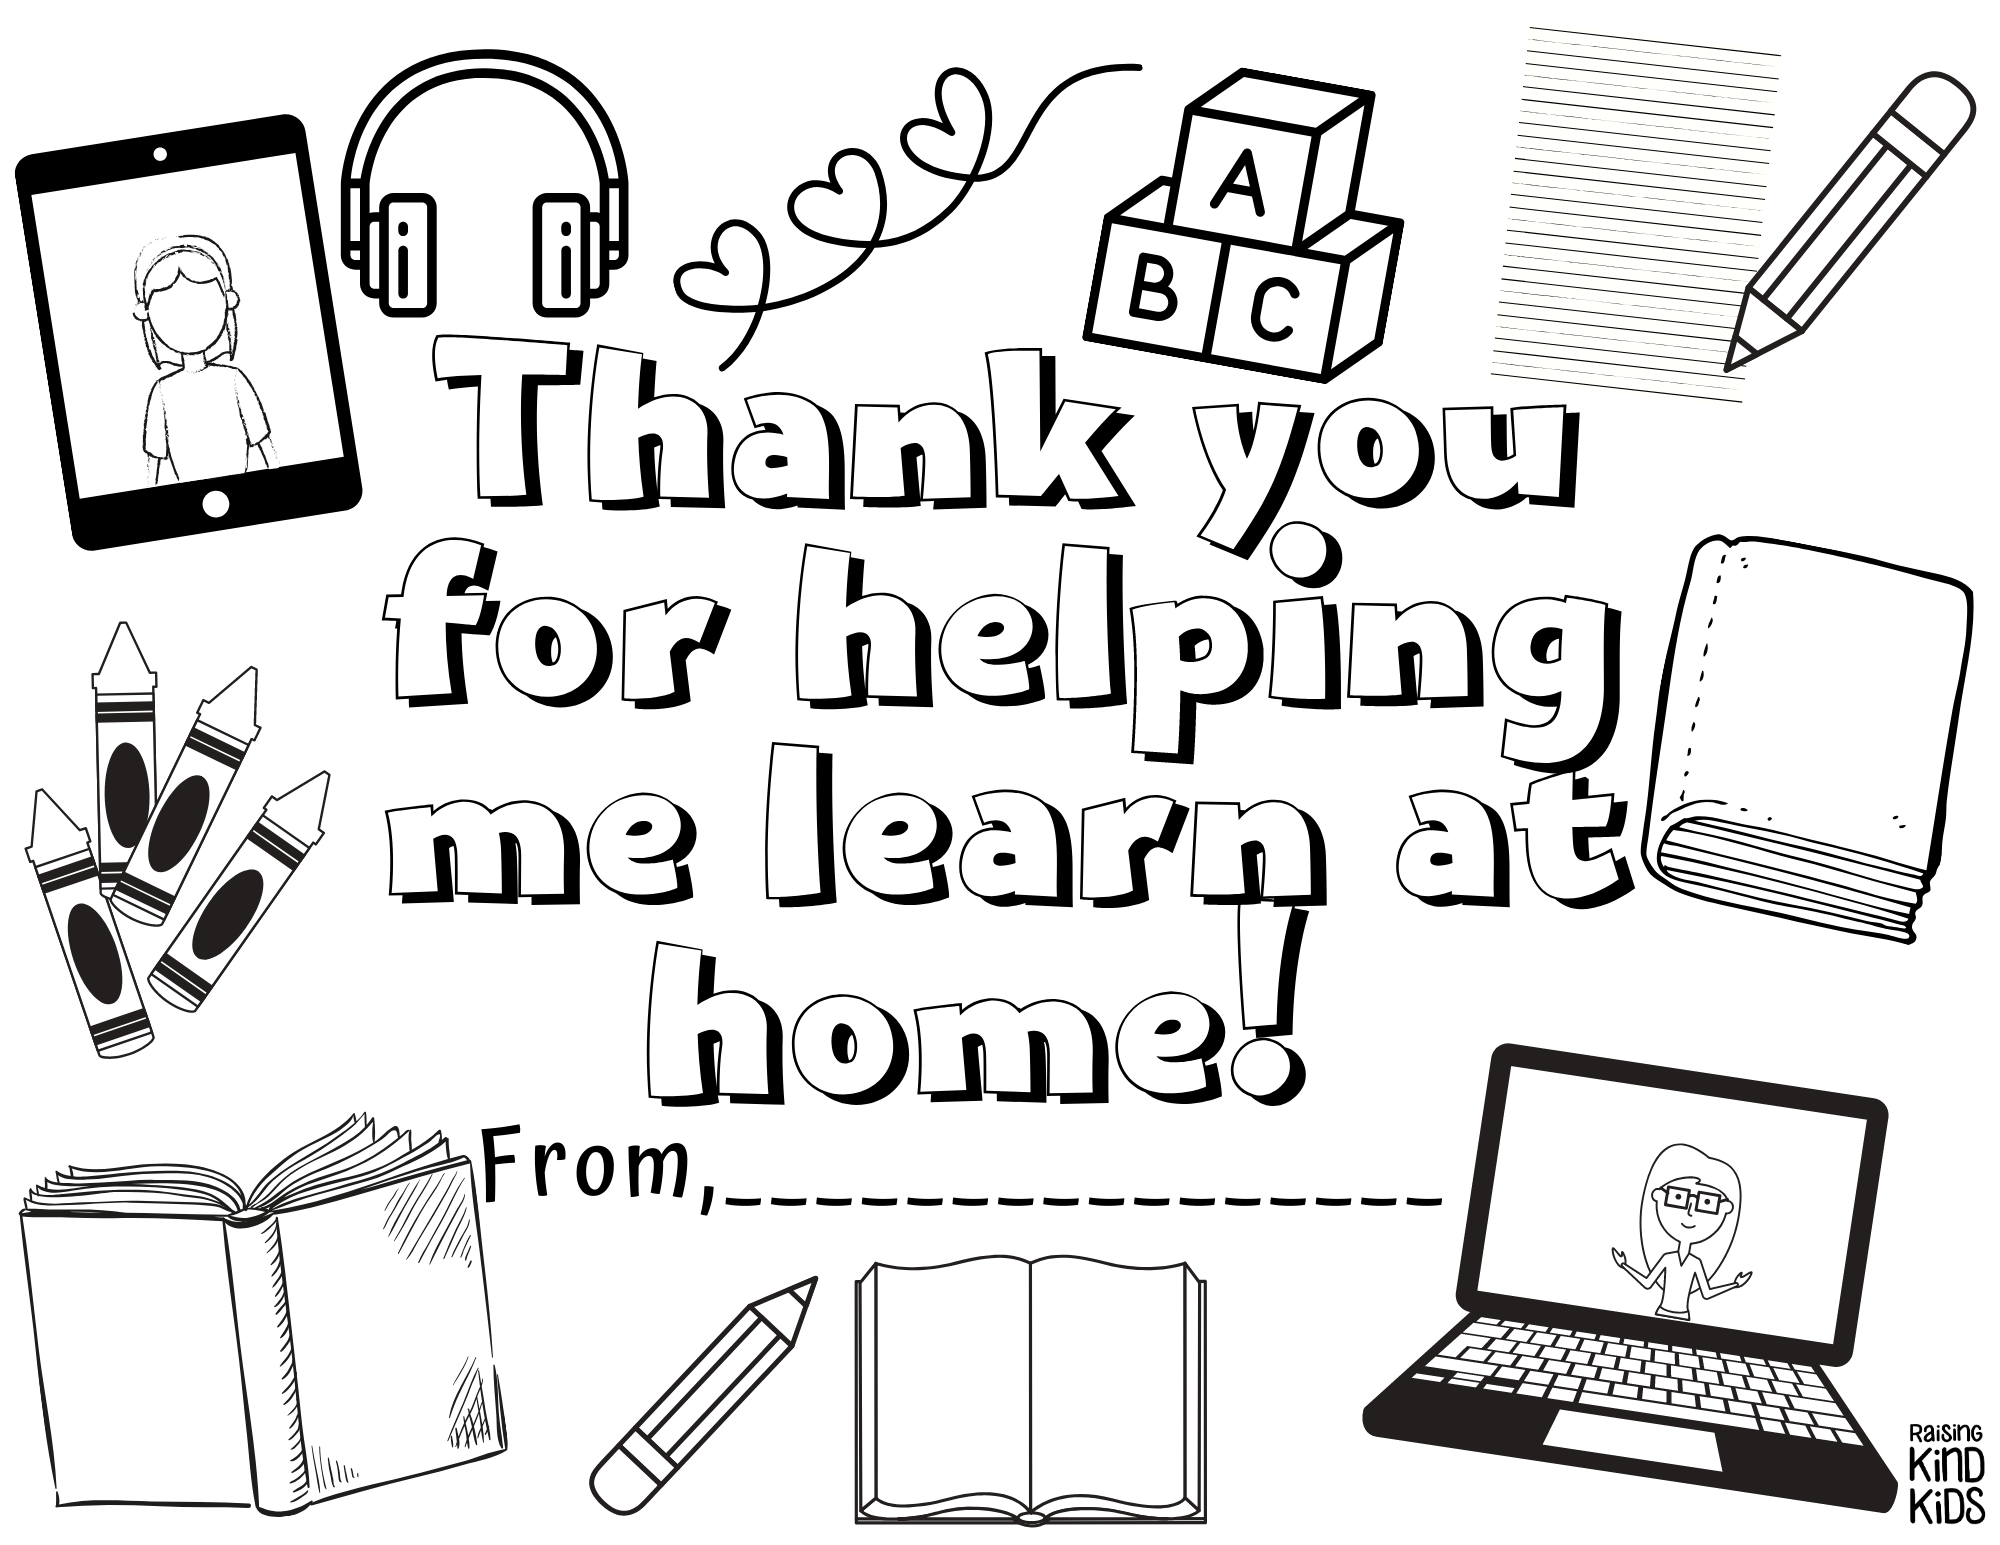 Pin on Teacher appreciation gifts